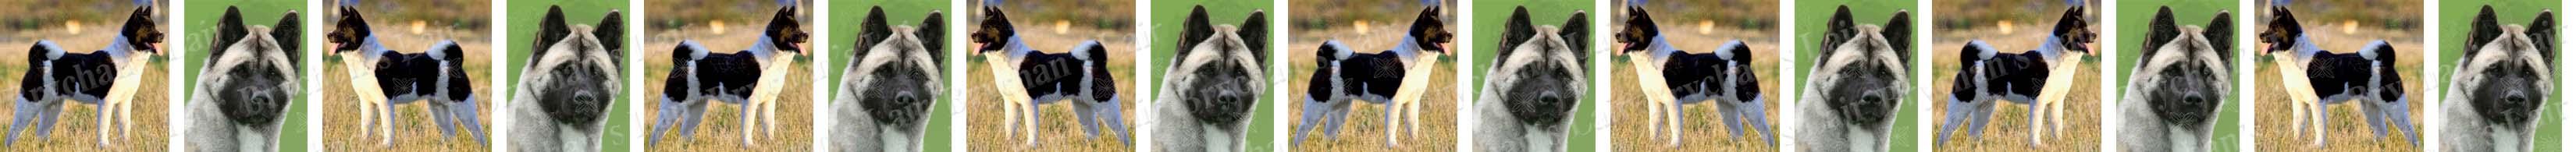 Akita Black & White Dog Breed Custom Printed Grosgrain Ribbon